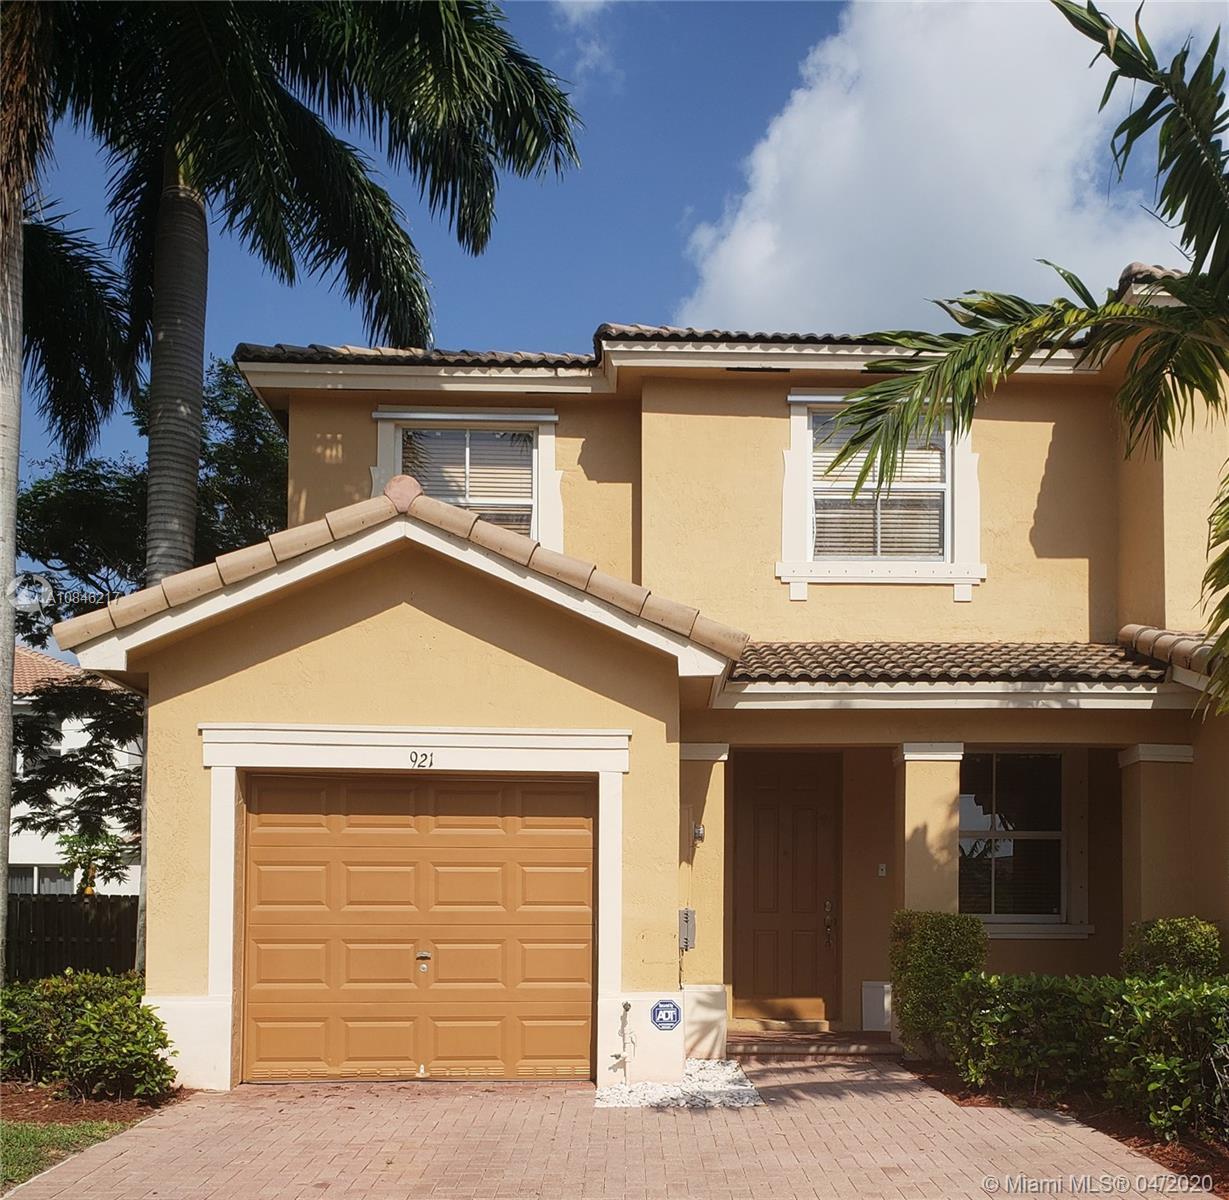 921 NE 42nd Ave, Homestead, FL 33033 - Homestead, FL real estate listing